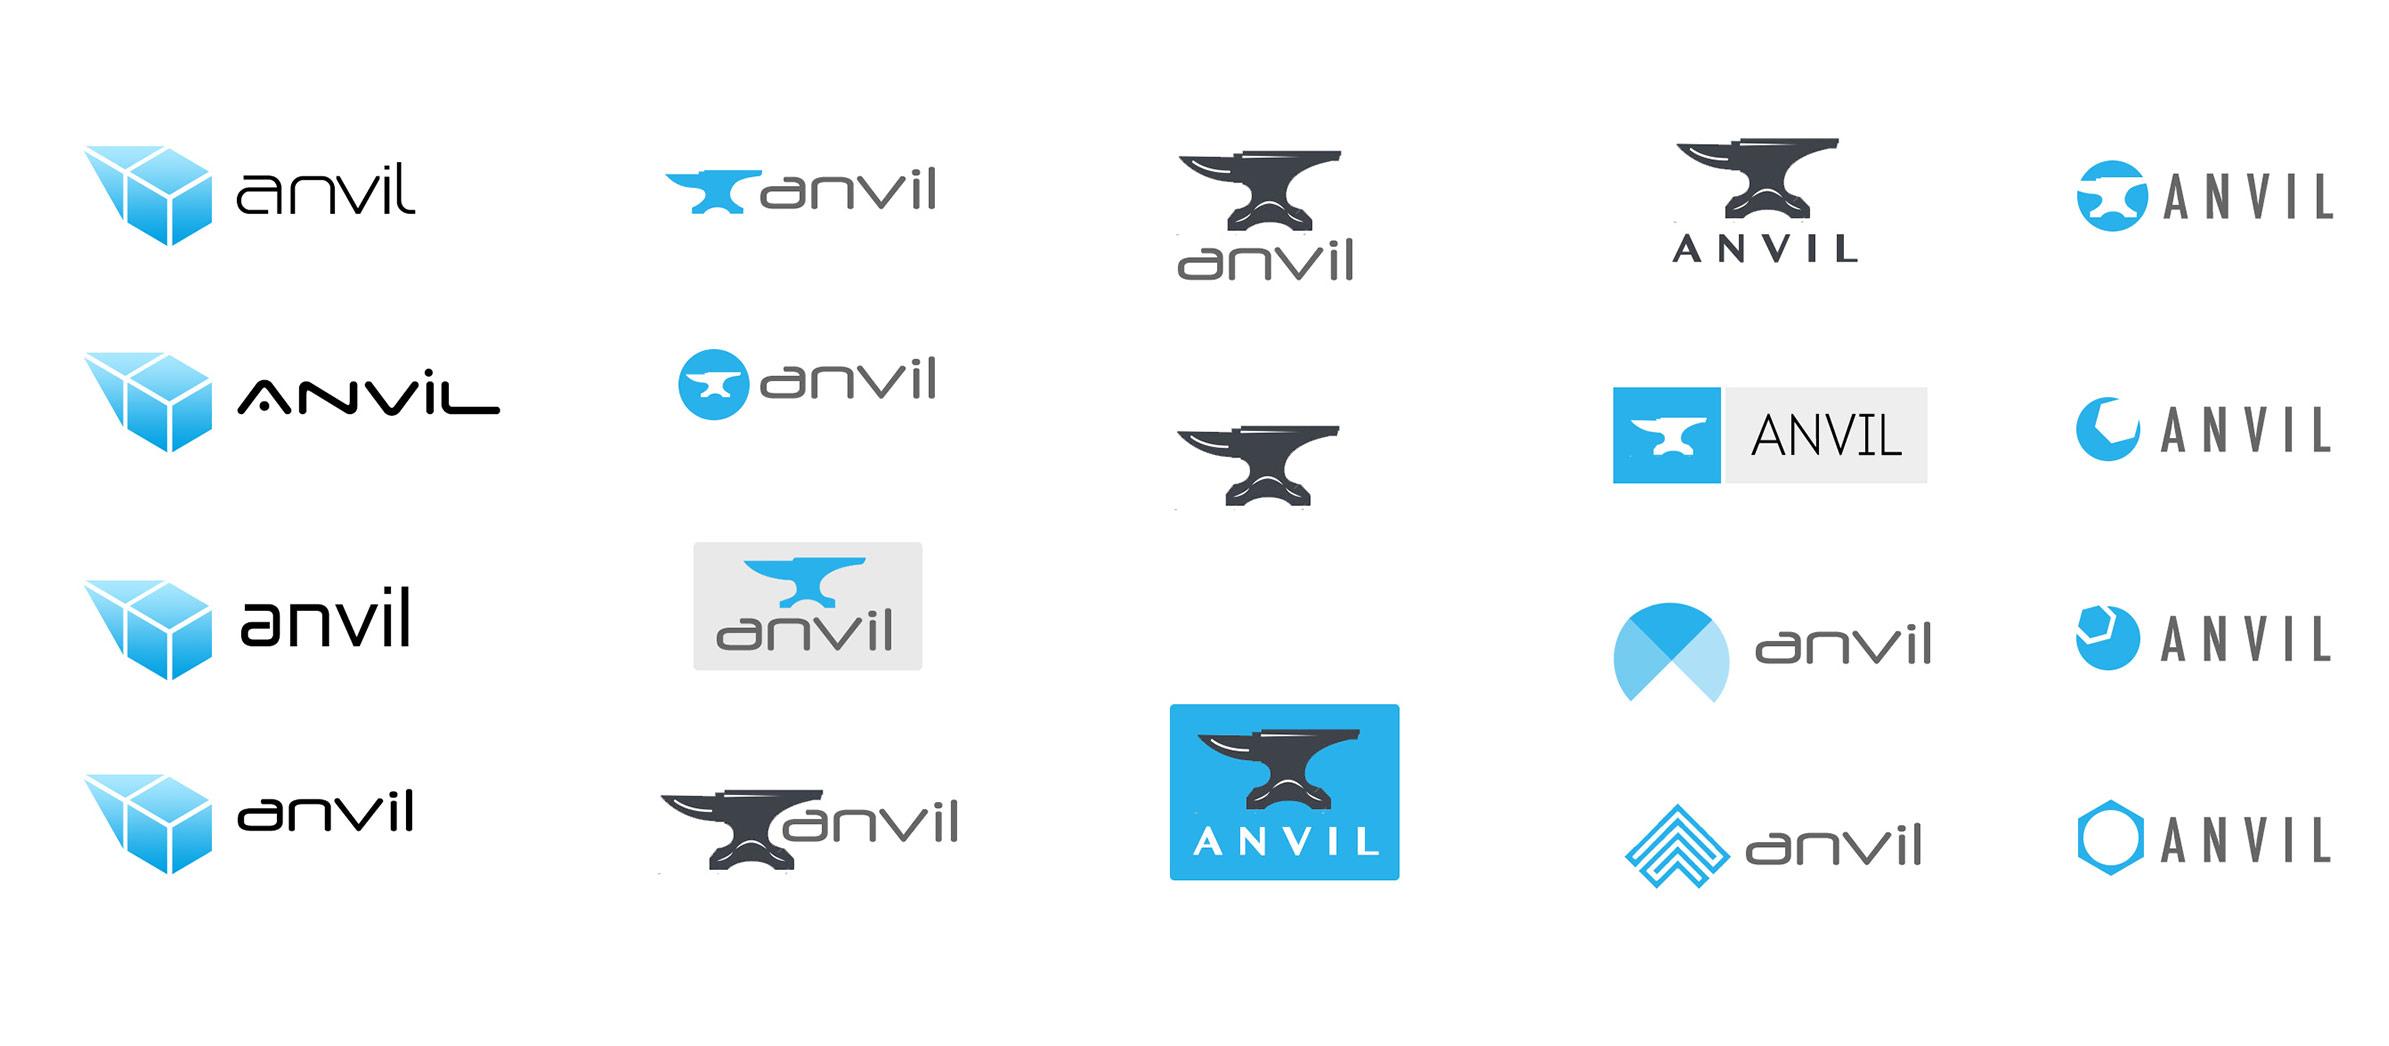 anvil-logo2.1.jpg